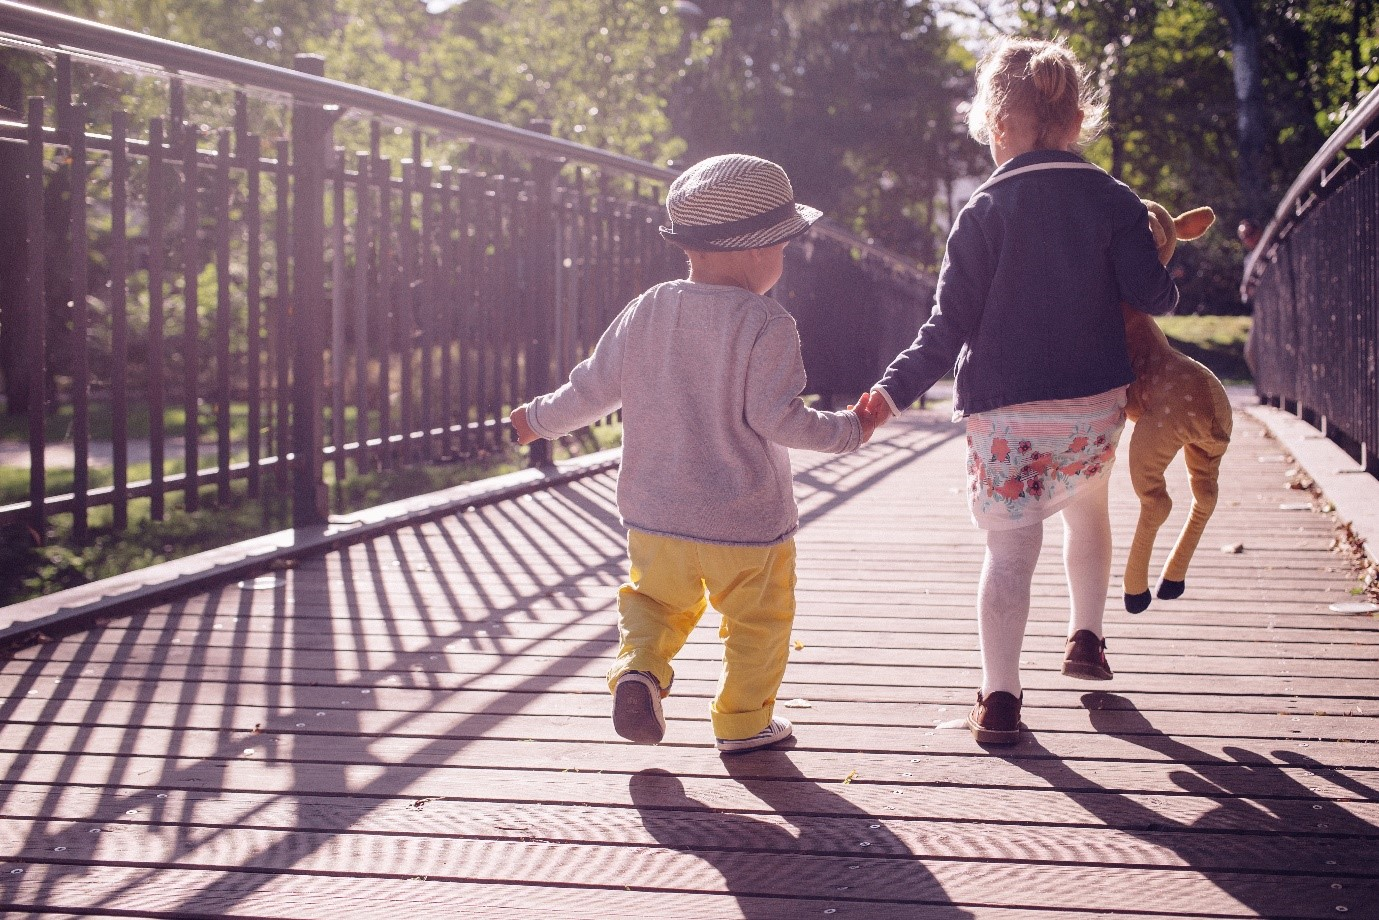 De Leukste Kinderkleding.Hoe Vind Ik De Leukste Kinderkleding Liveintheliving Nl